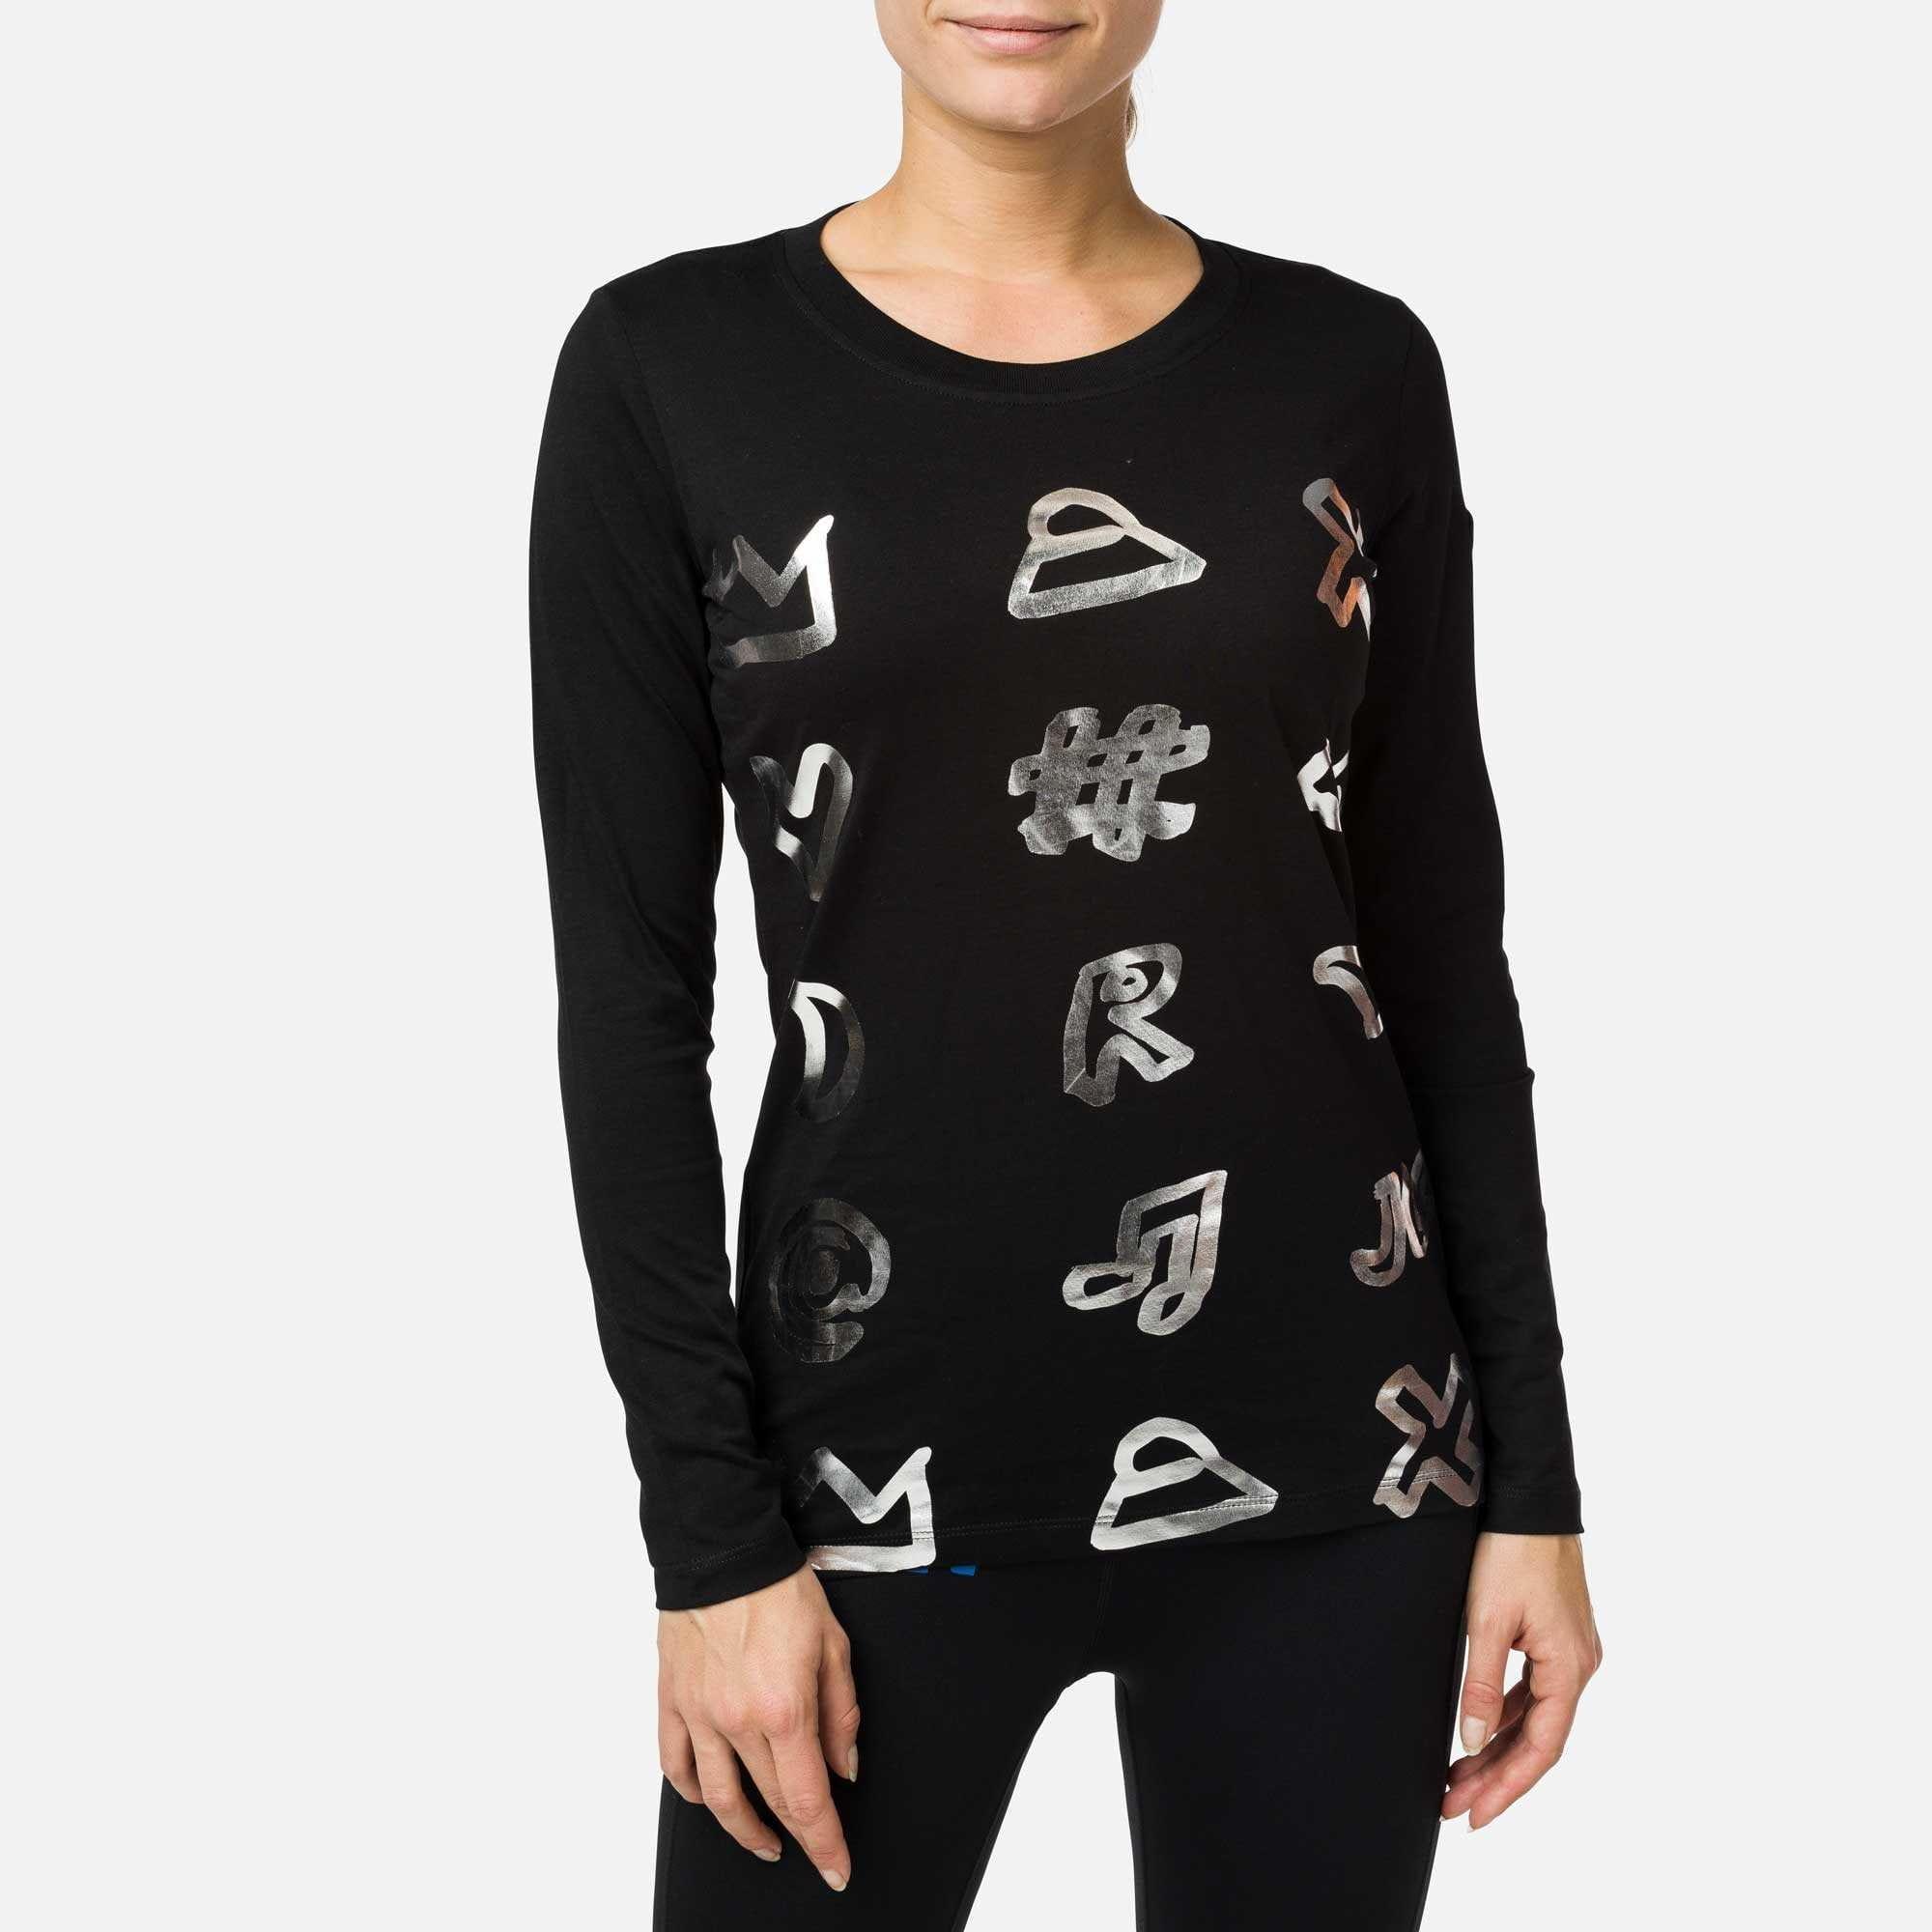 T shirt ROSSIGNOL SKY IN SKI   S'portofino